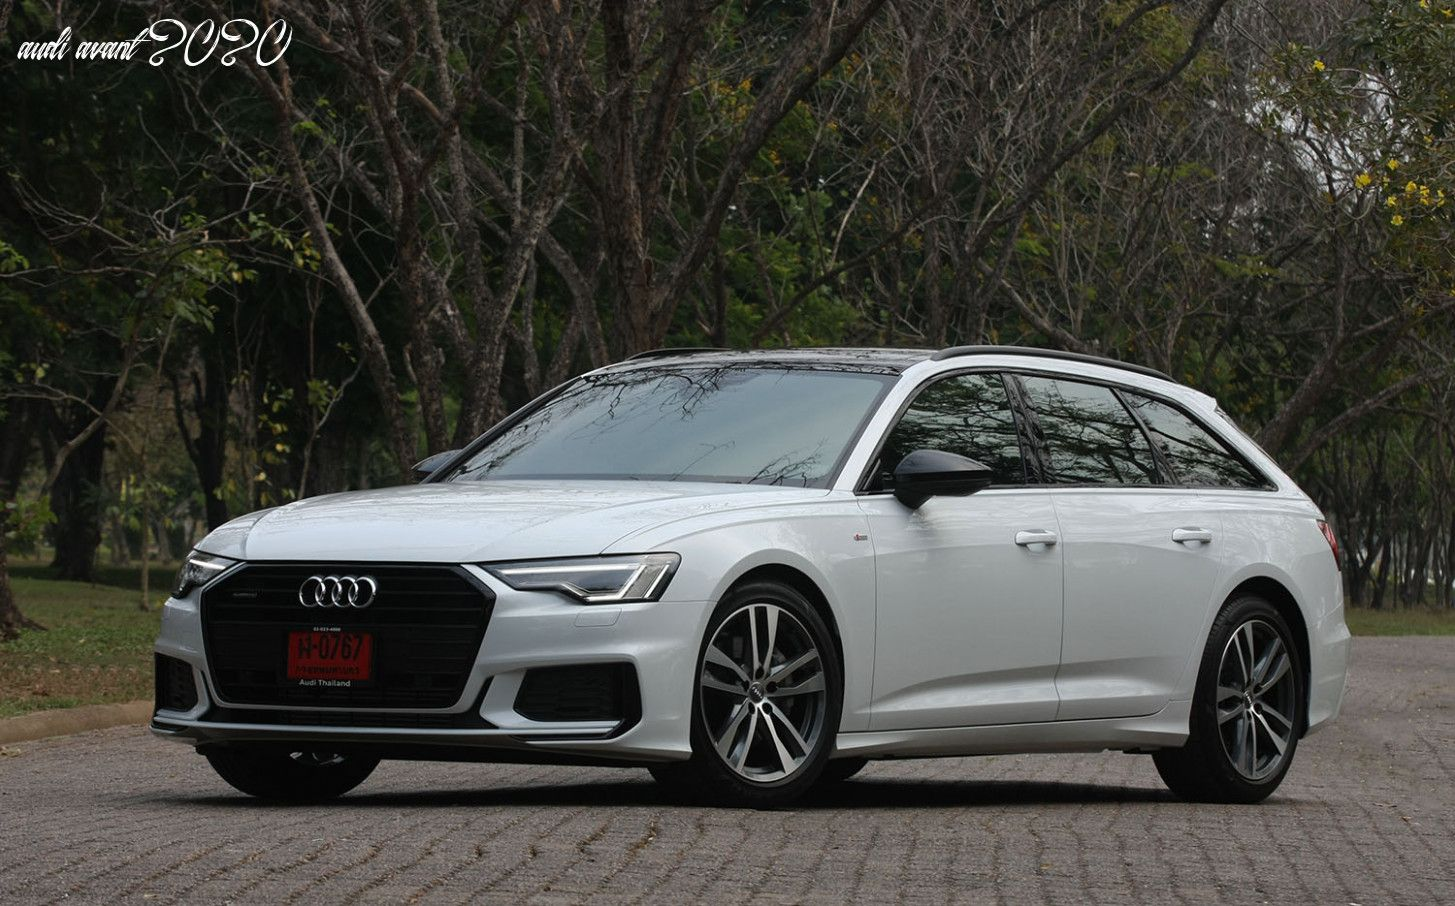 Audi Avant 2020 In 2020 Audi A6 Avant A6 Avant Audi A6